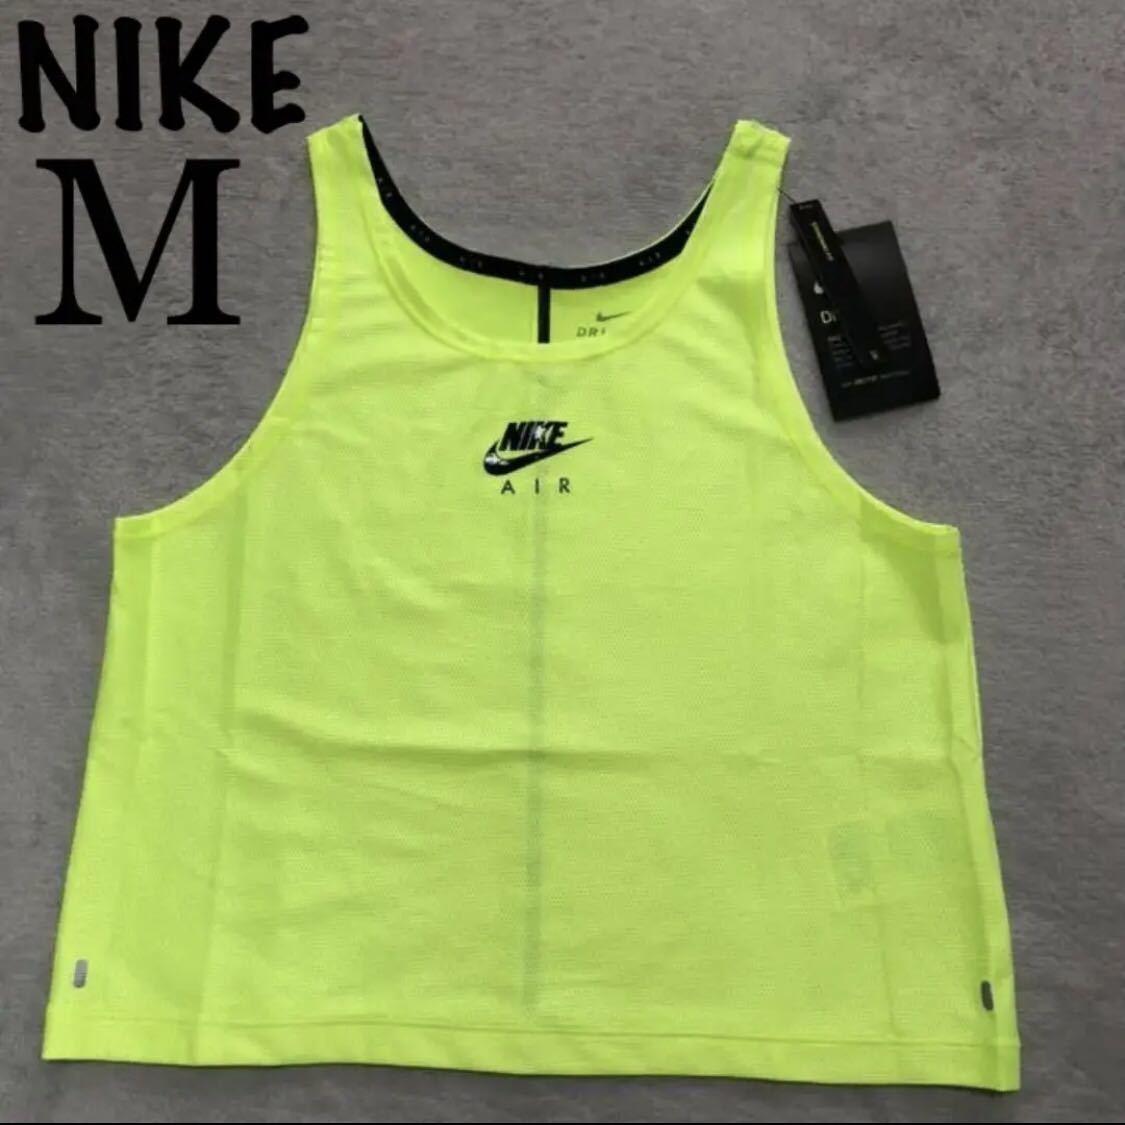 M ナイキ タンクトップ ランタンクトップ タンク マラソン スポーツウェア ナイキタンクトップ ランニングシャツ NIKE 新品タグ付き